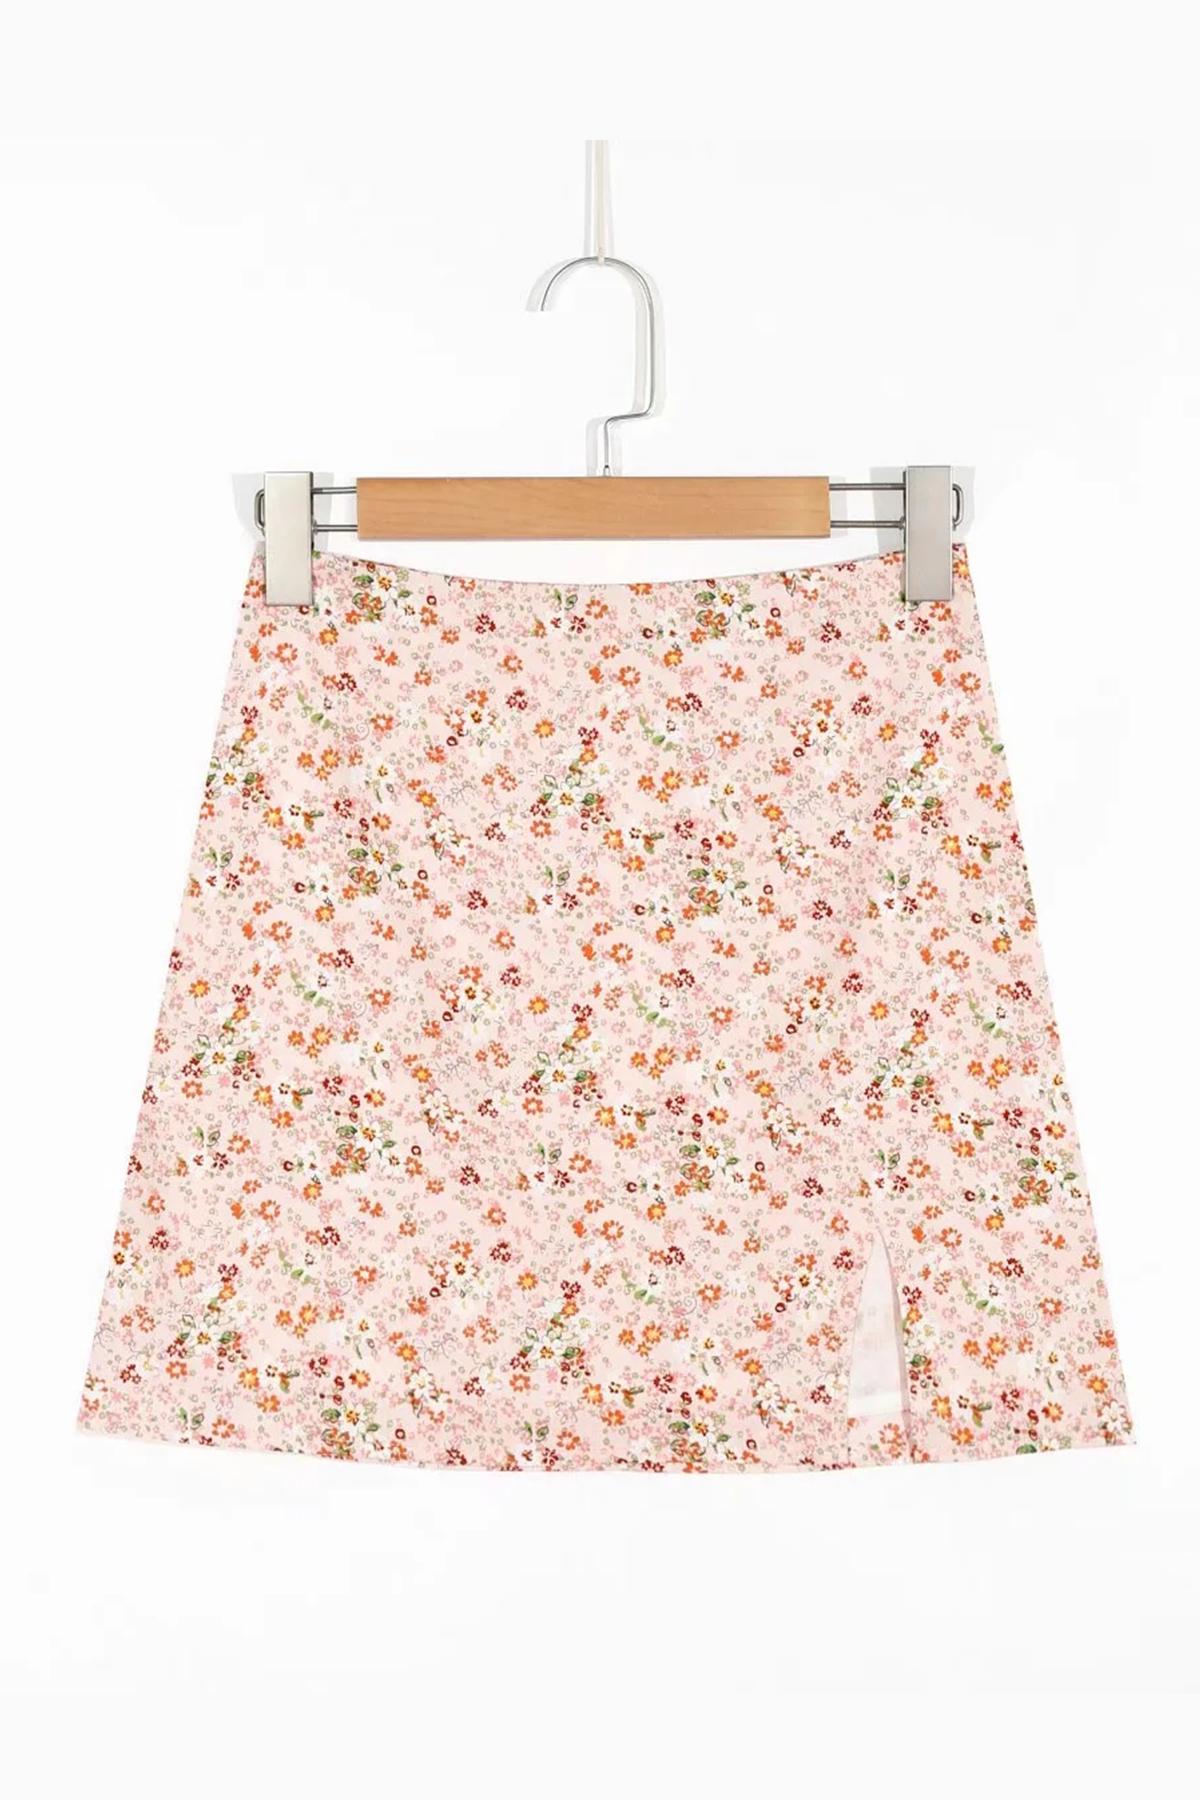 THE MOODSS Allegra Skirt-1